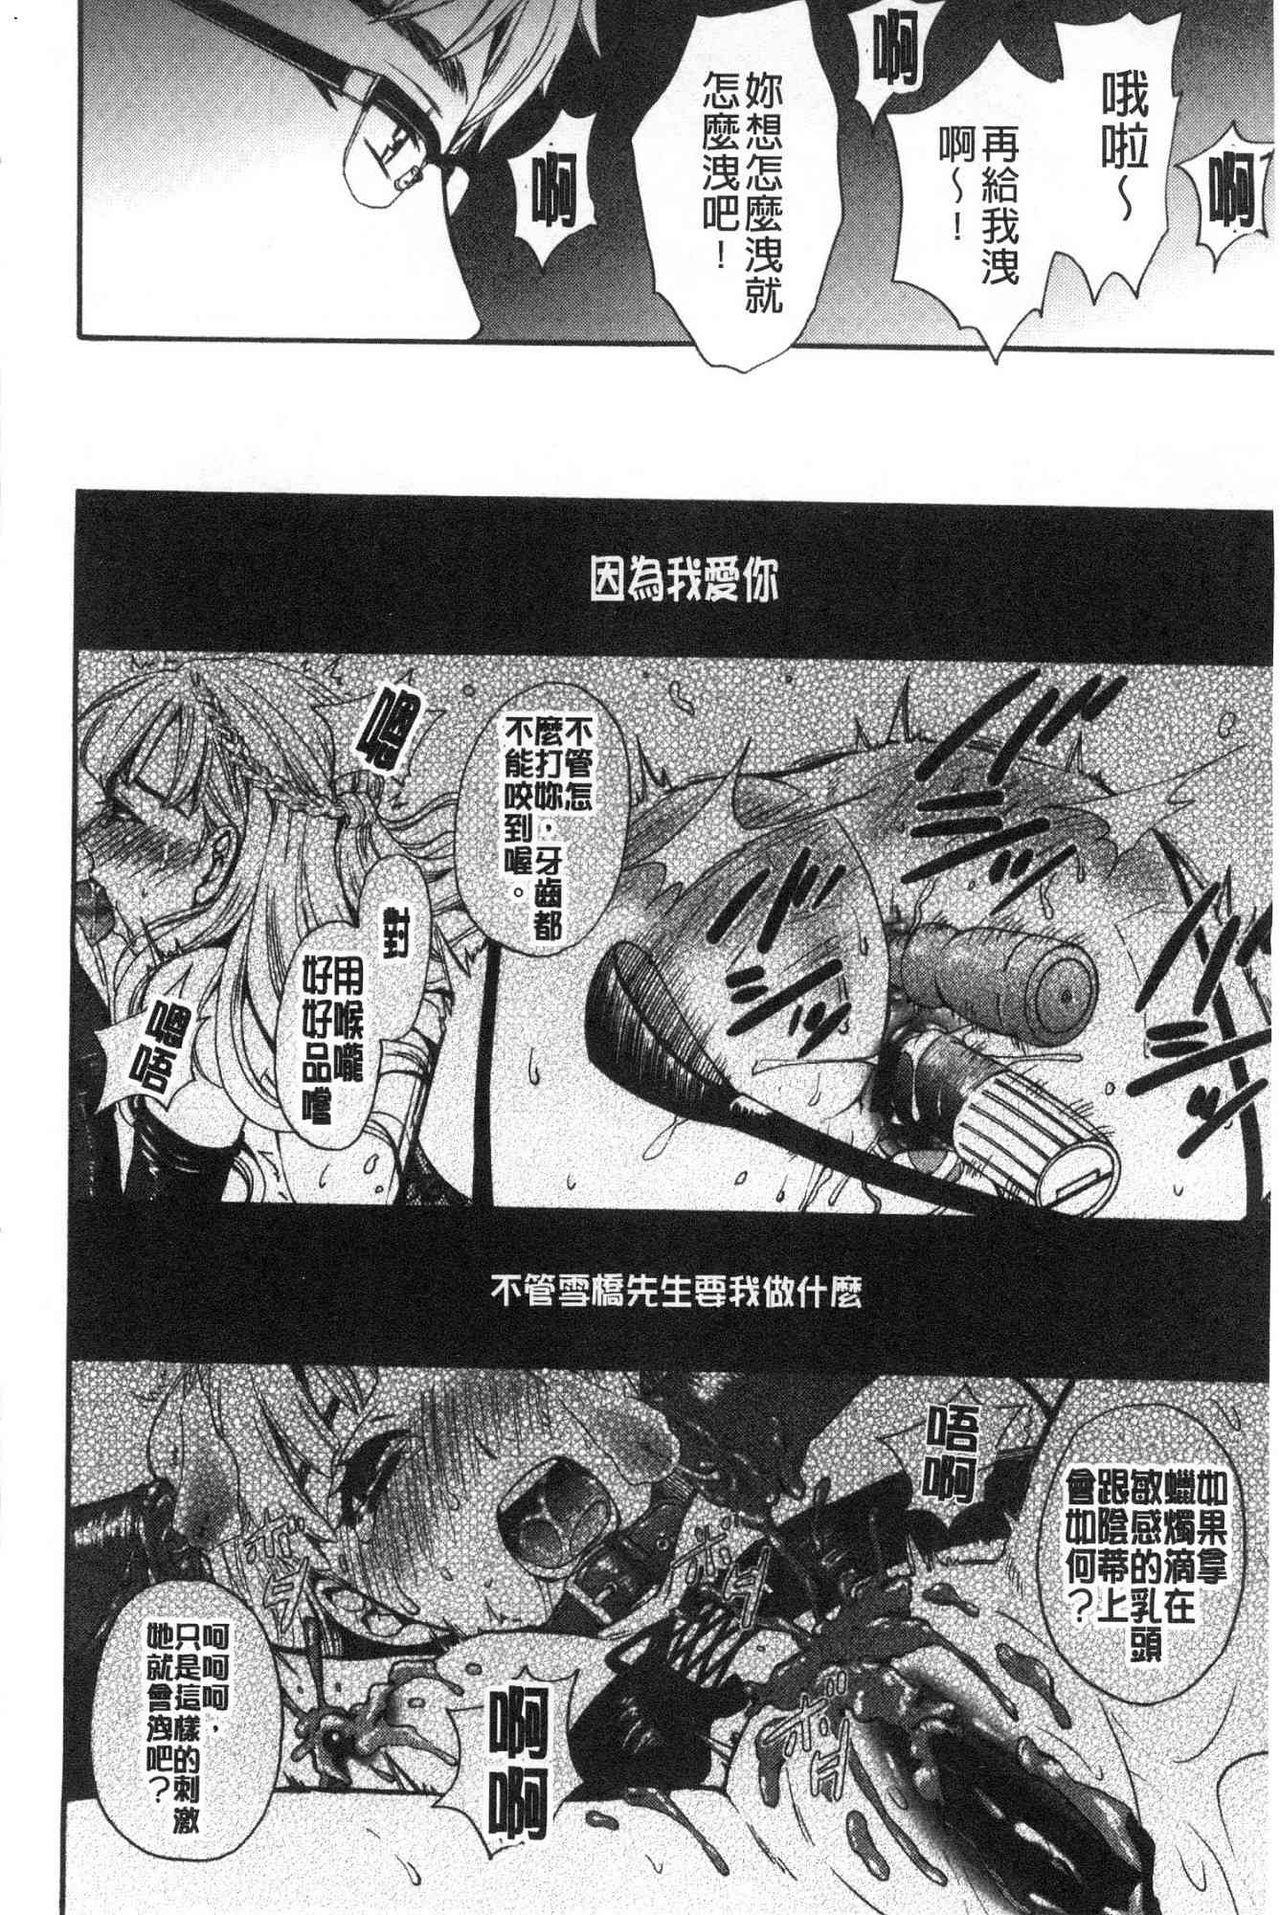 [Gotoh Akira]  21-ji no Onna ~Camera no Mae no Mesuinu~ 2 | 21時之女 ~鏡頭前的牝犬~ 2 [Chinese] 89